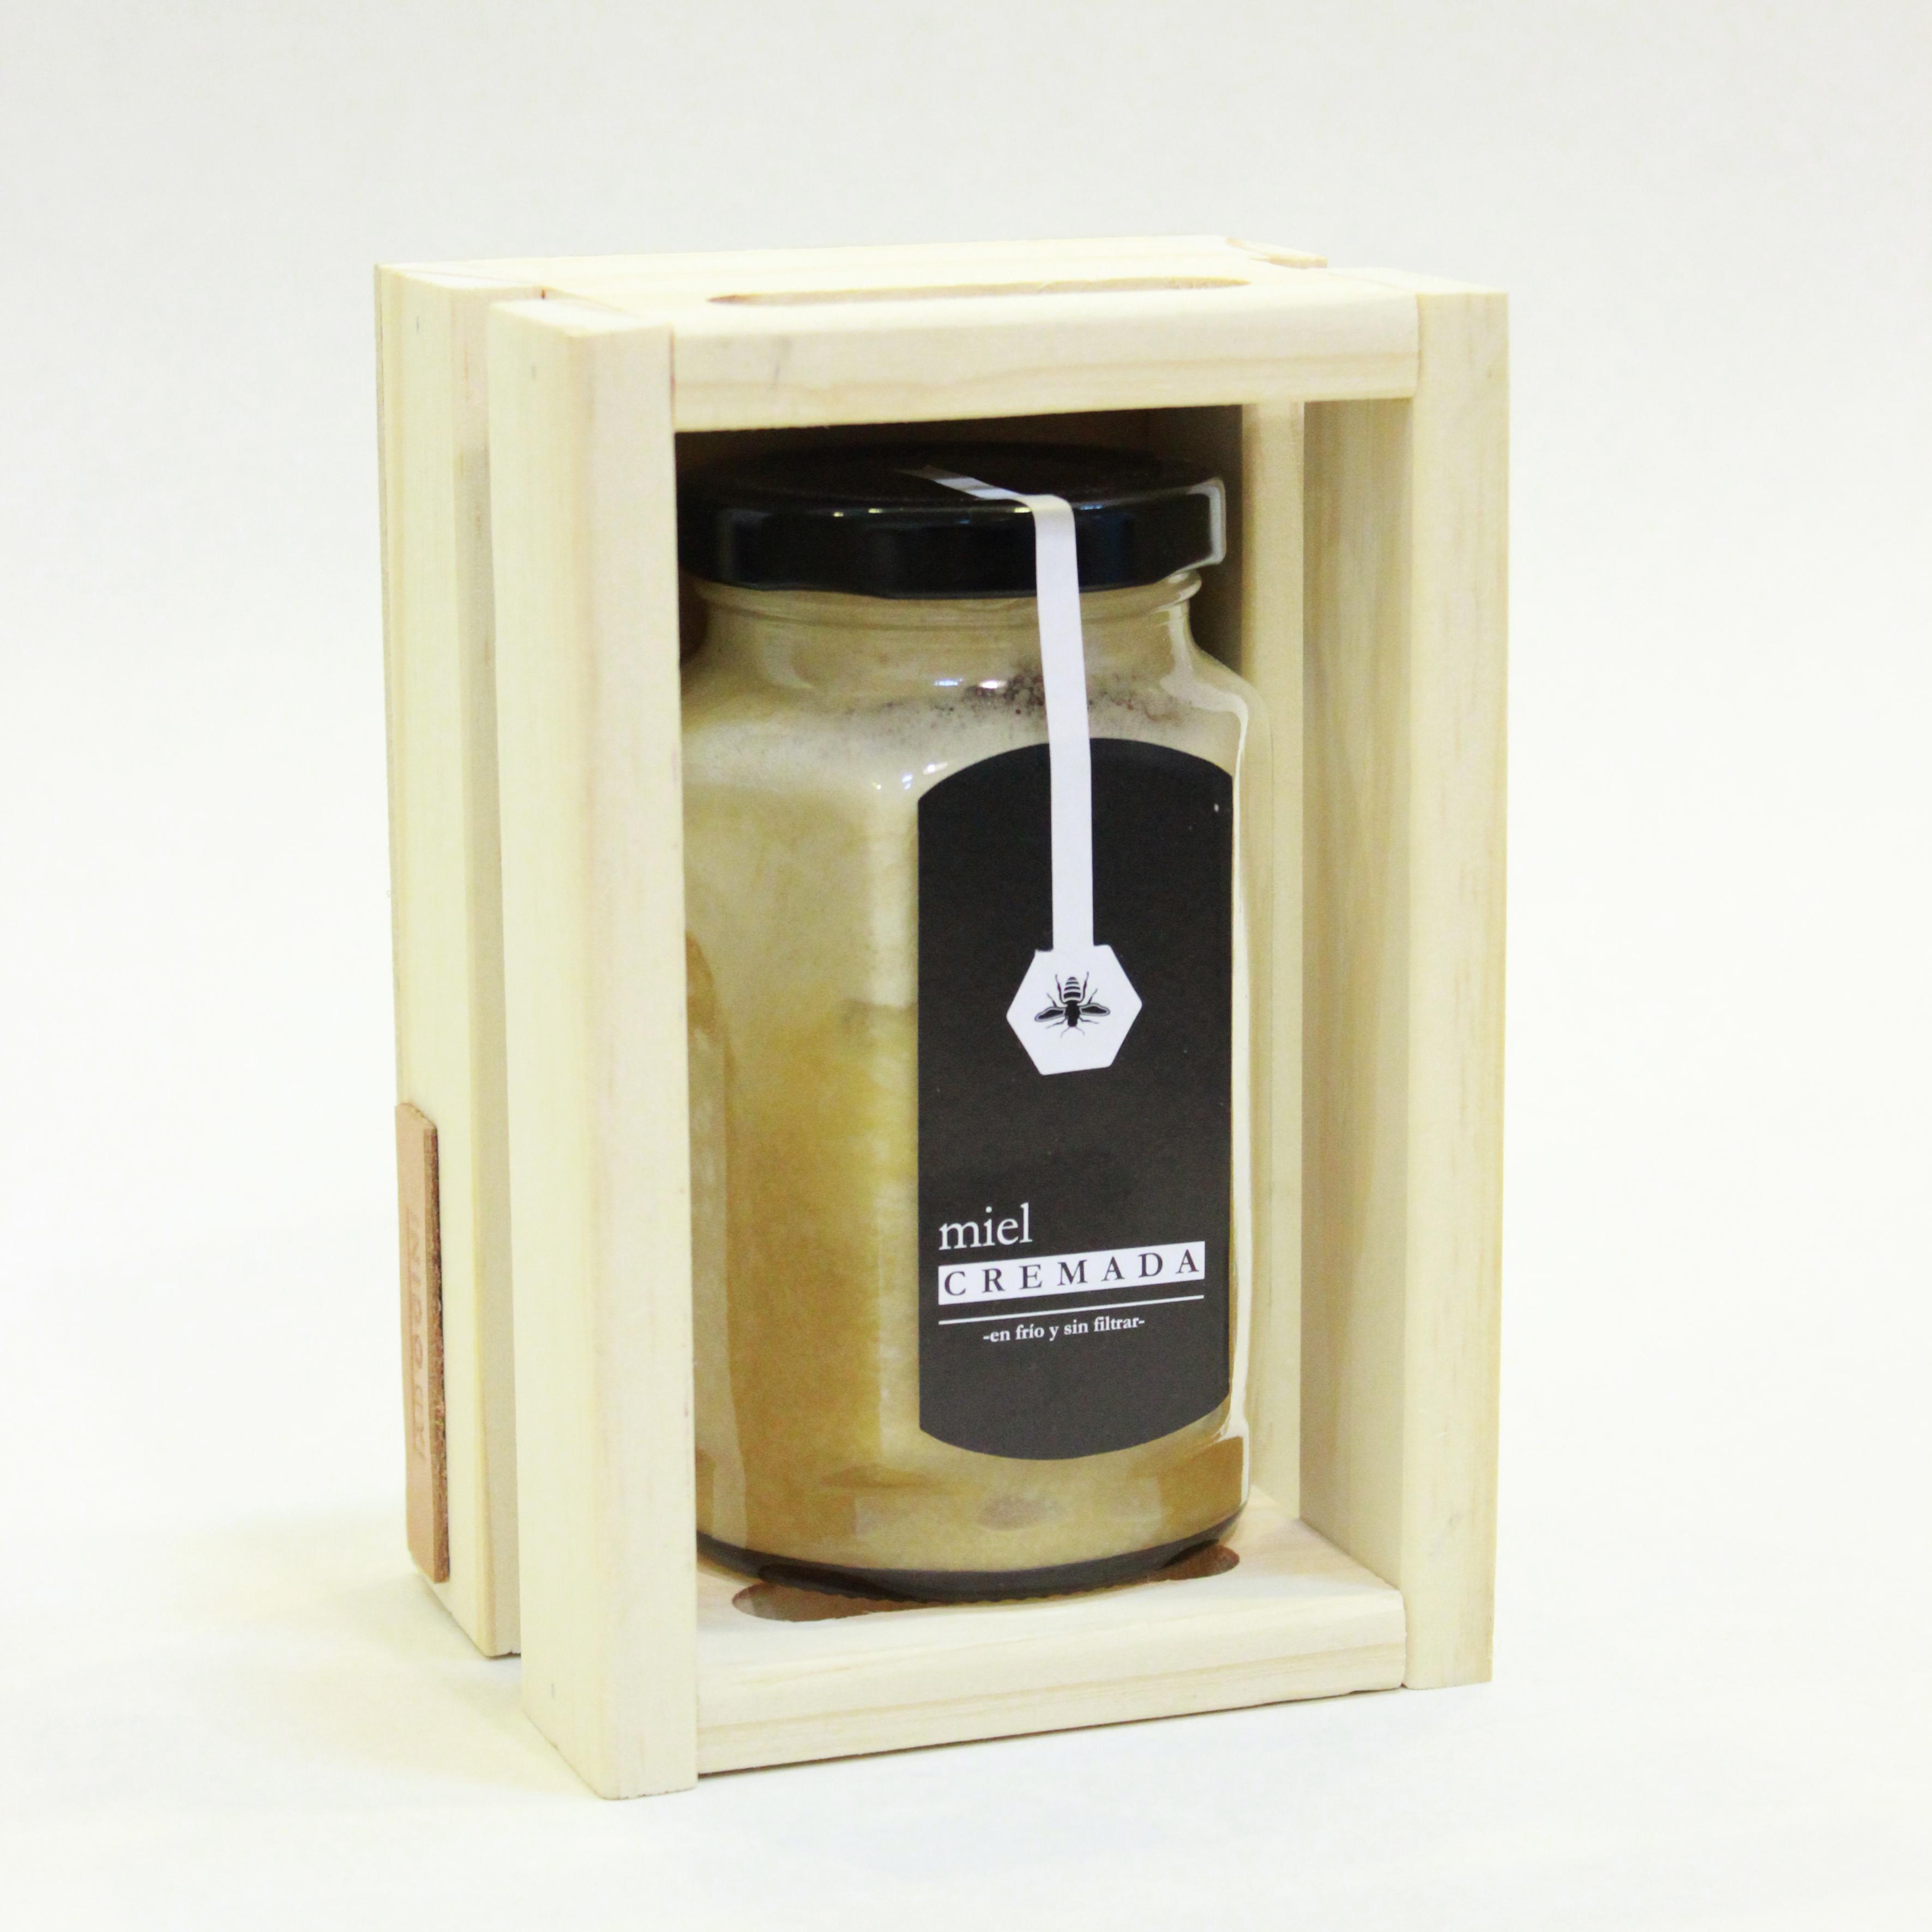 Kit cremada de miel